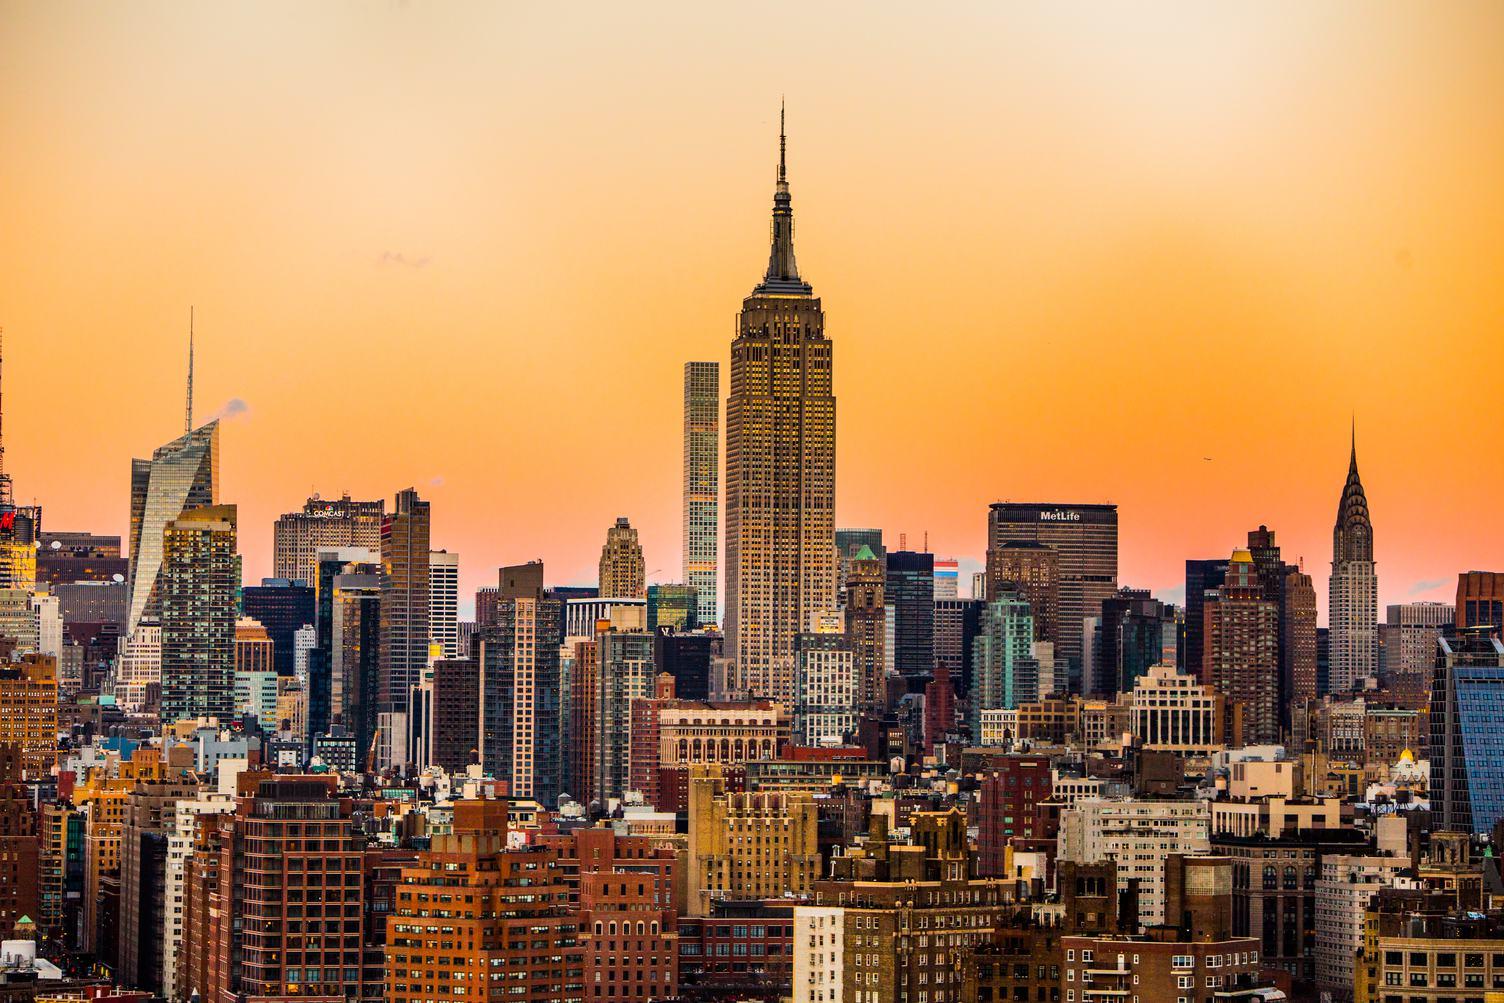 Manhattan, New York City Skyline at Sunset